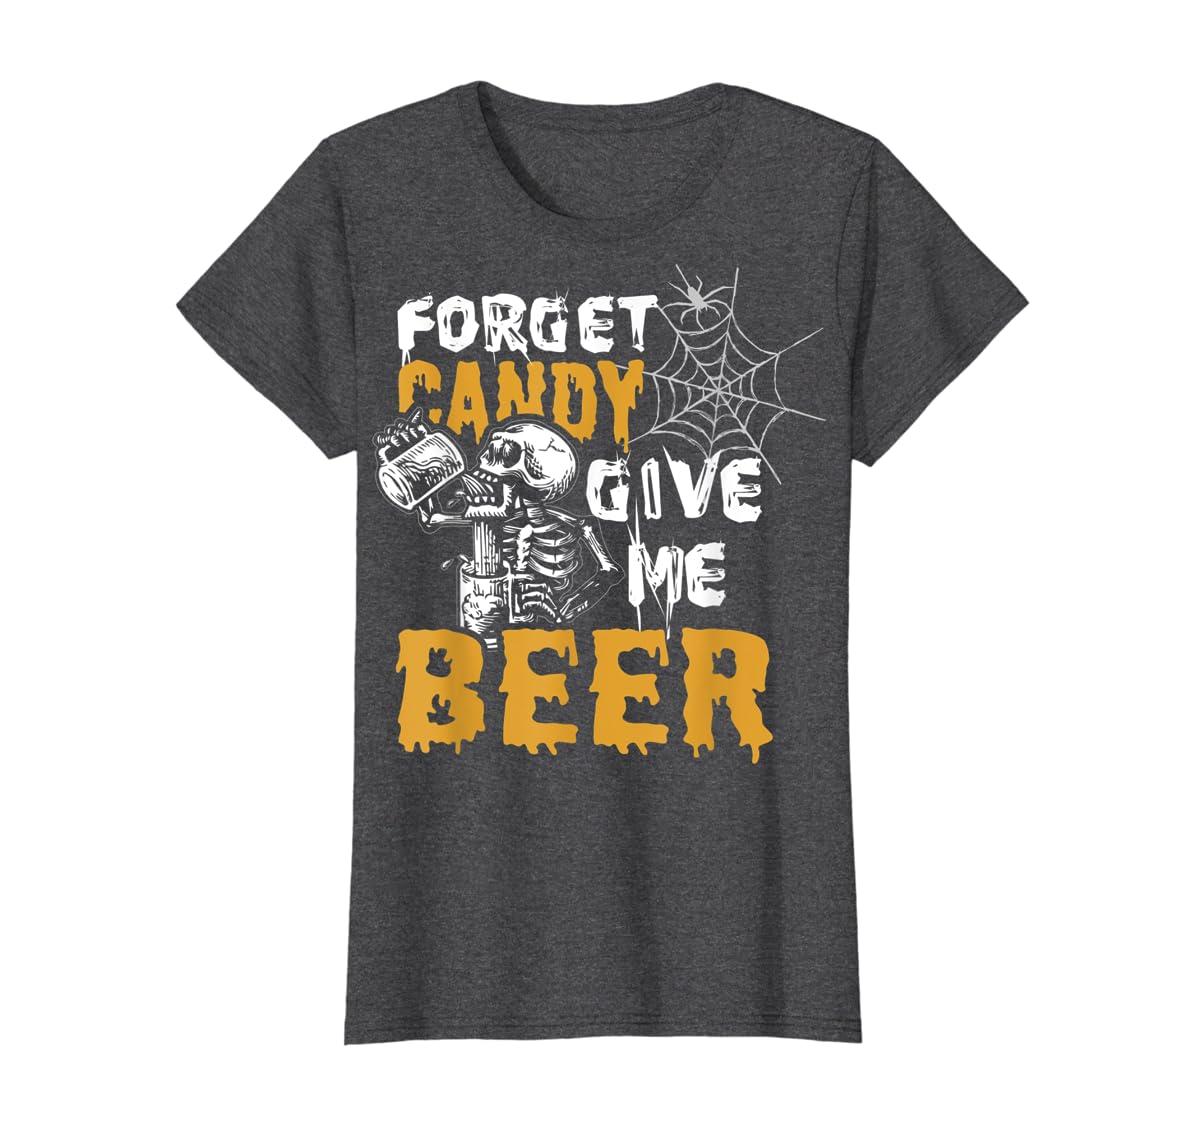 Forget Candy Give me Beer shirt Halloween Shirt gifts T-Shirt-Women's T-Shirt-Dark Heather